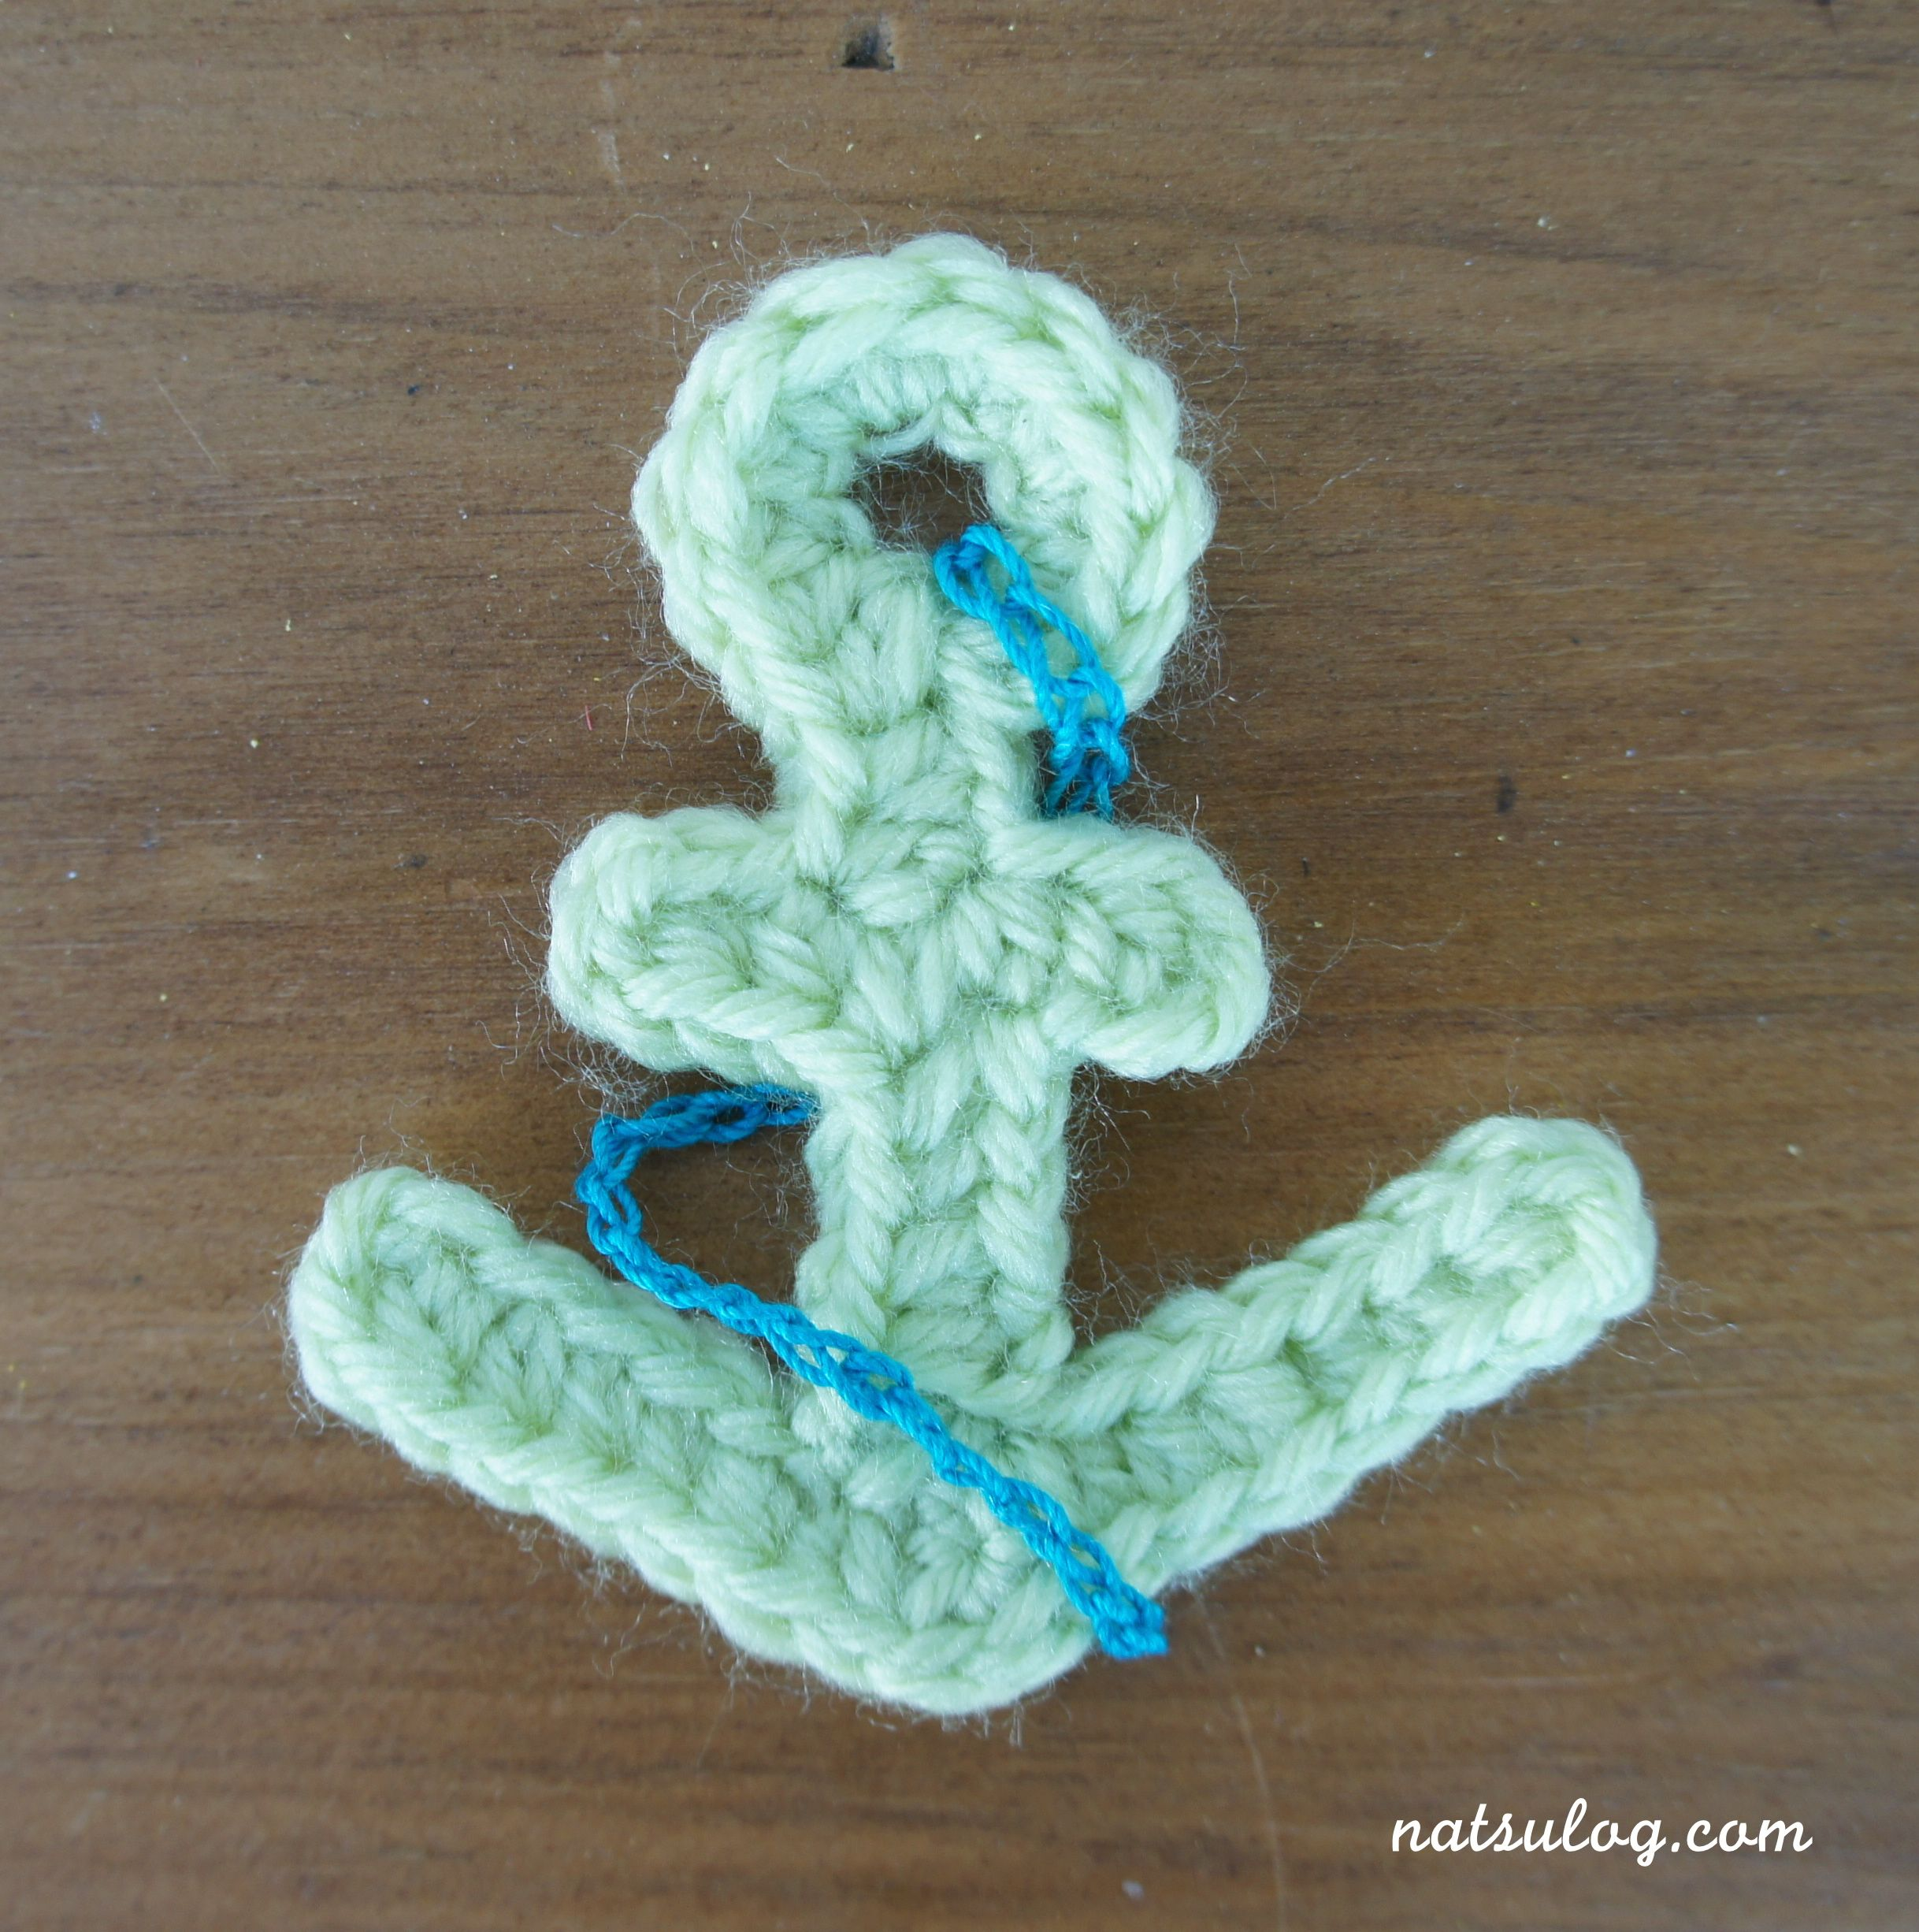 An Anchor Motif For Summer D Free Crochet Pattern Is Shown As Well